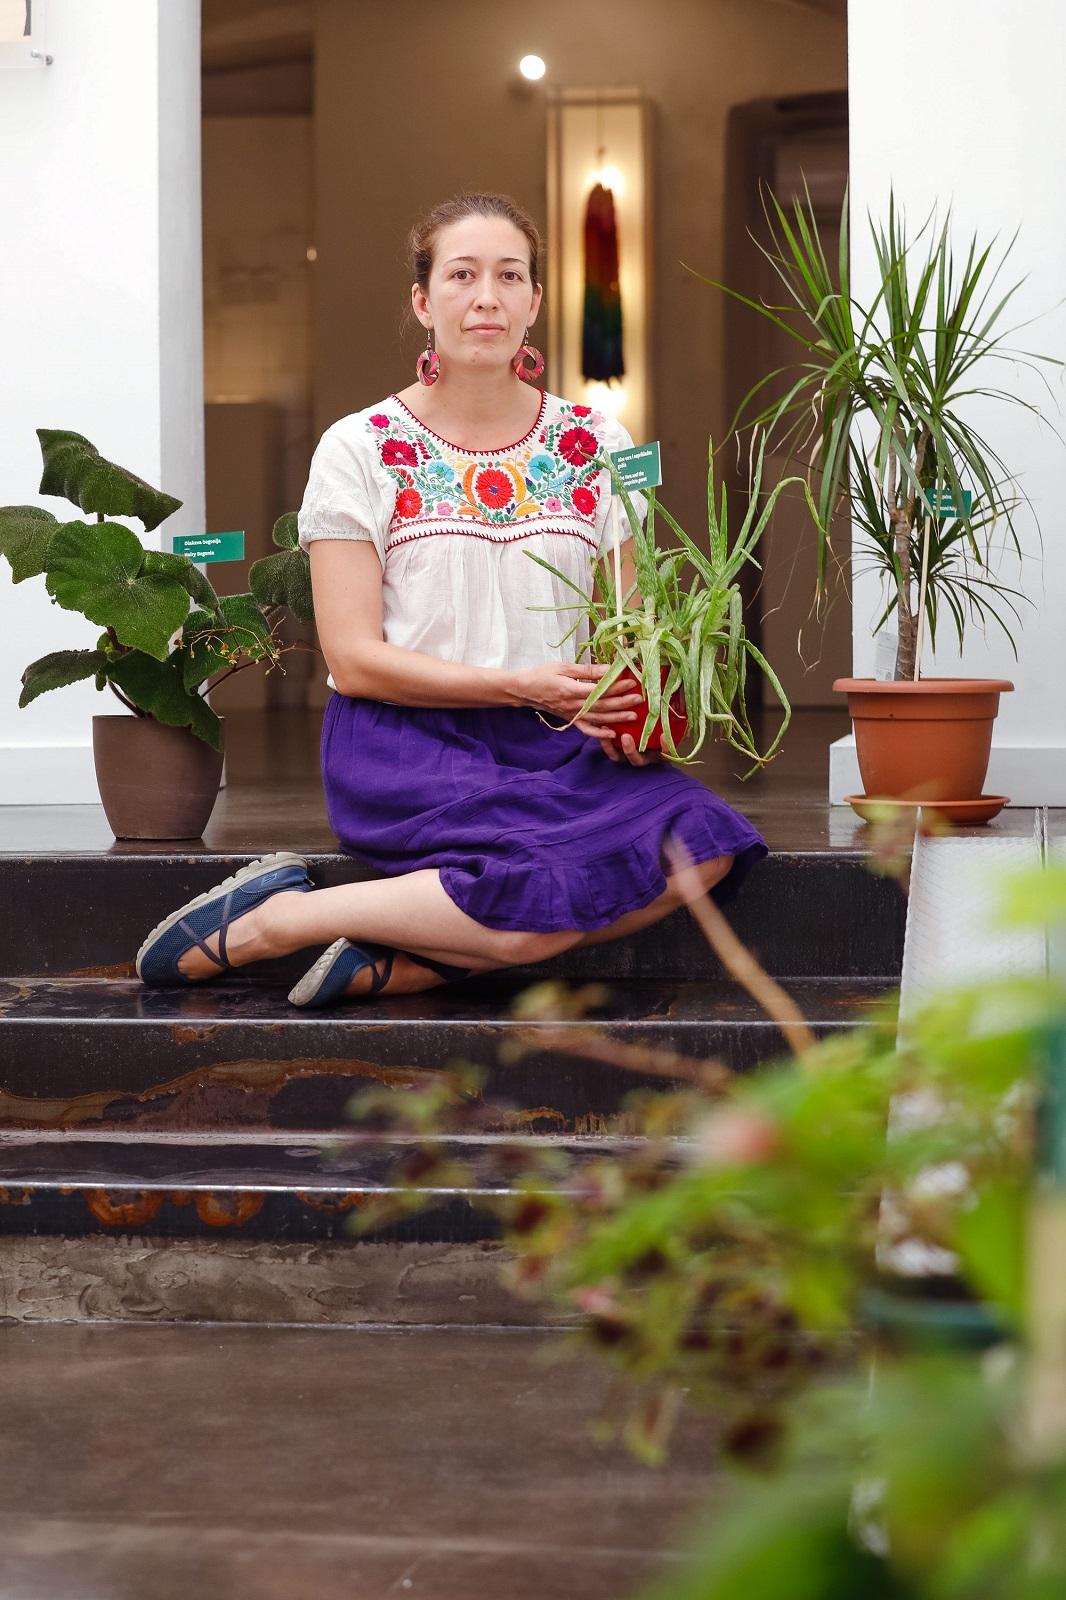 Zagreb, 290720. Cirilometodska ulica. Hotel za biljke otvoren je u sklopu Muzeja prekinutih veza.  Na fotografiji: Ana Gabriela Sandoval Ferrera.  Foto: Marko Todorov / CROPIX